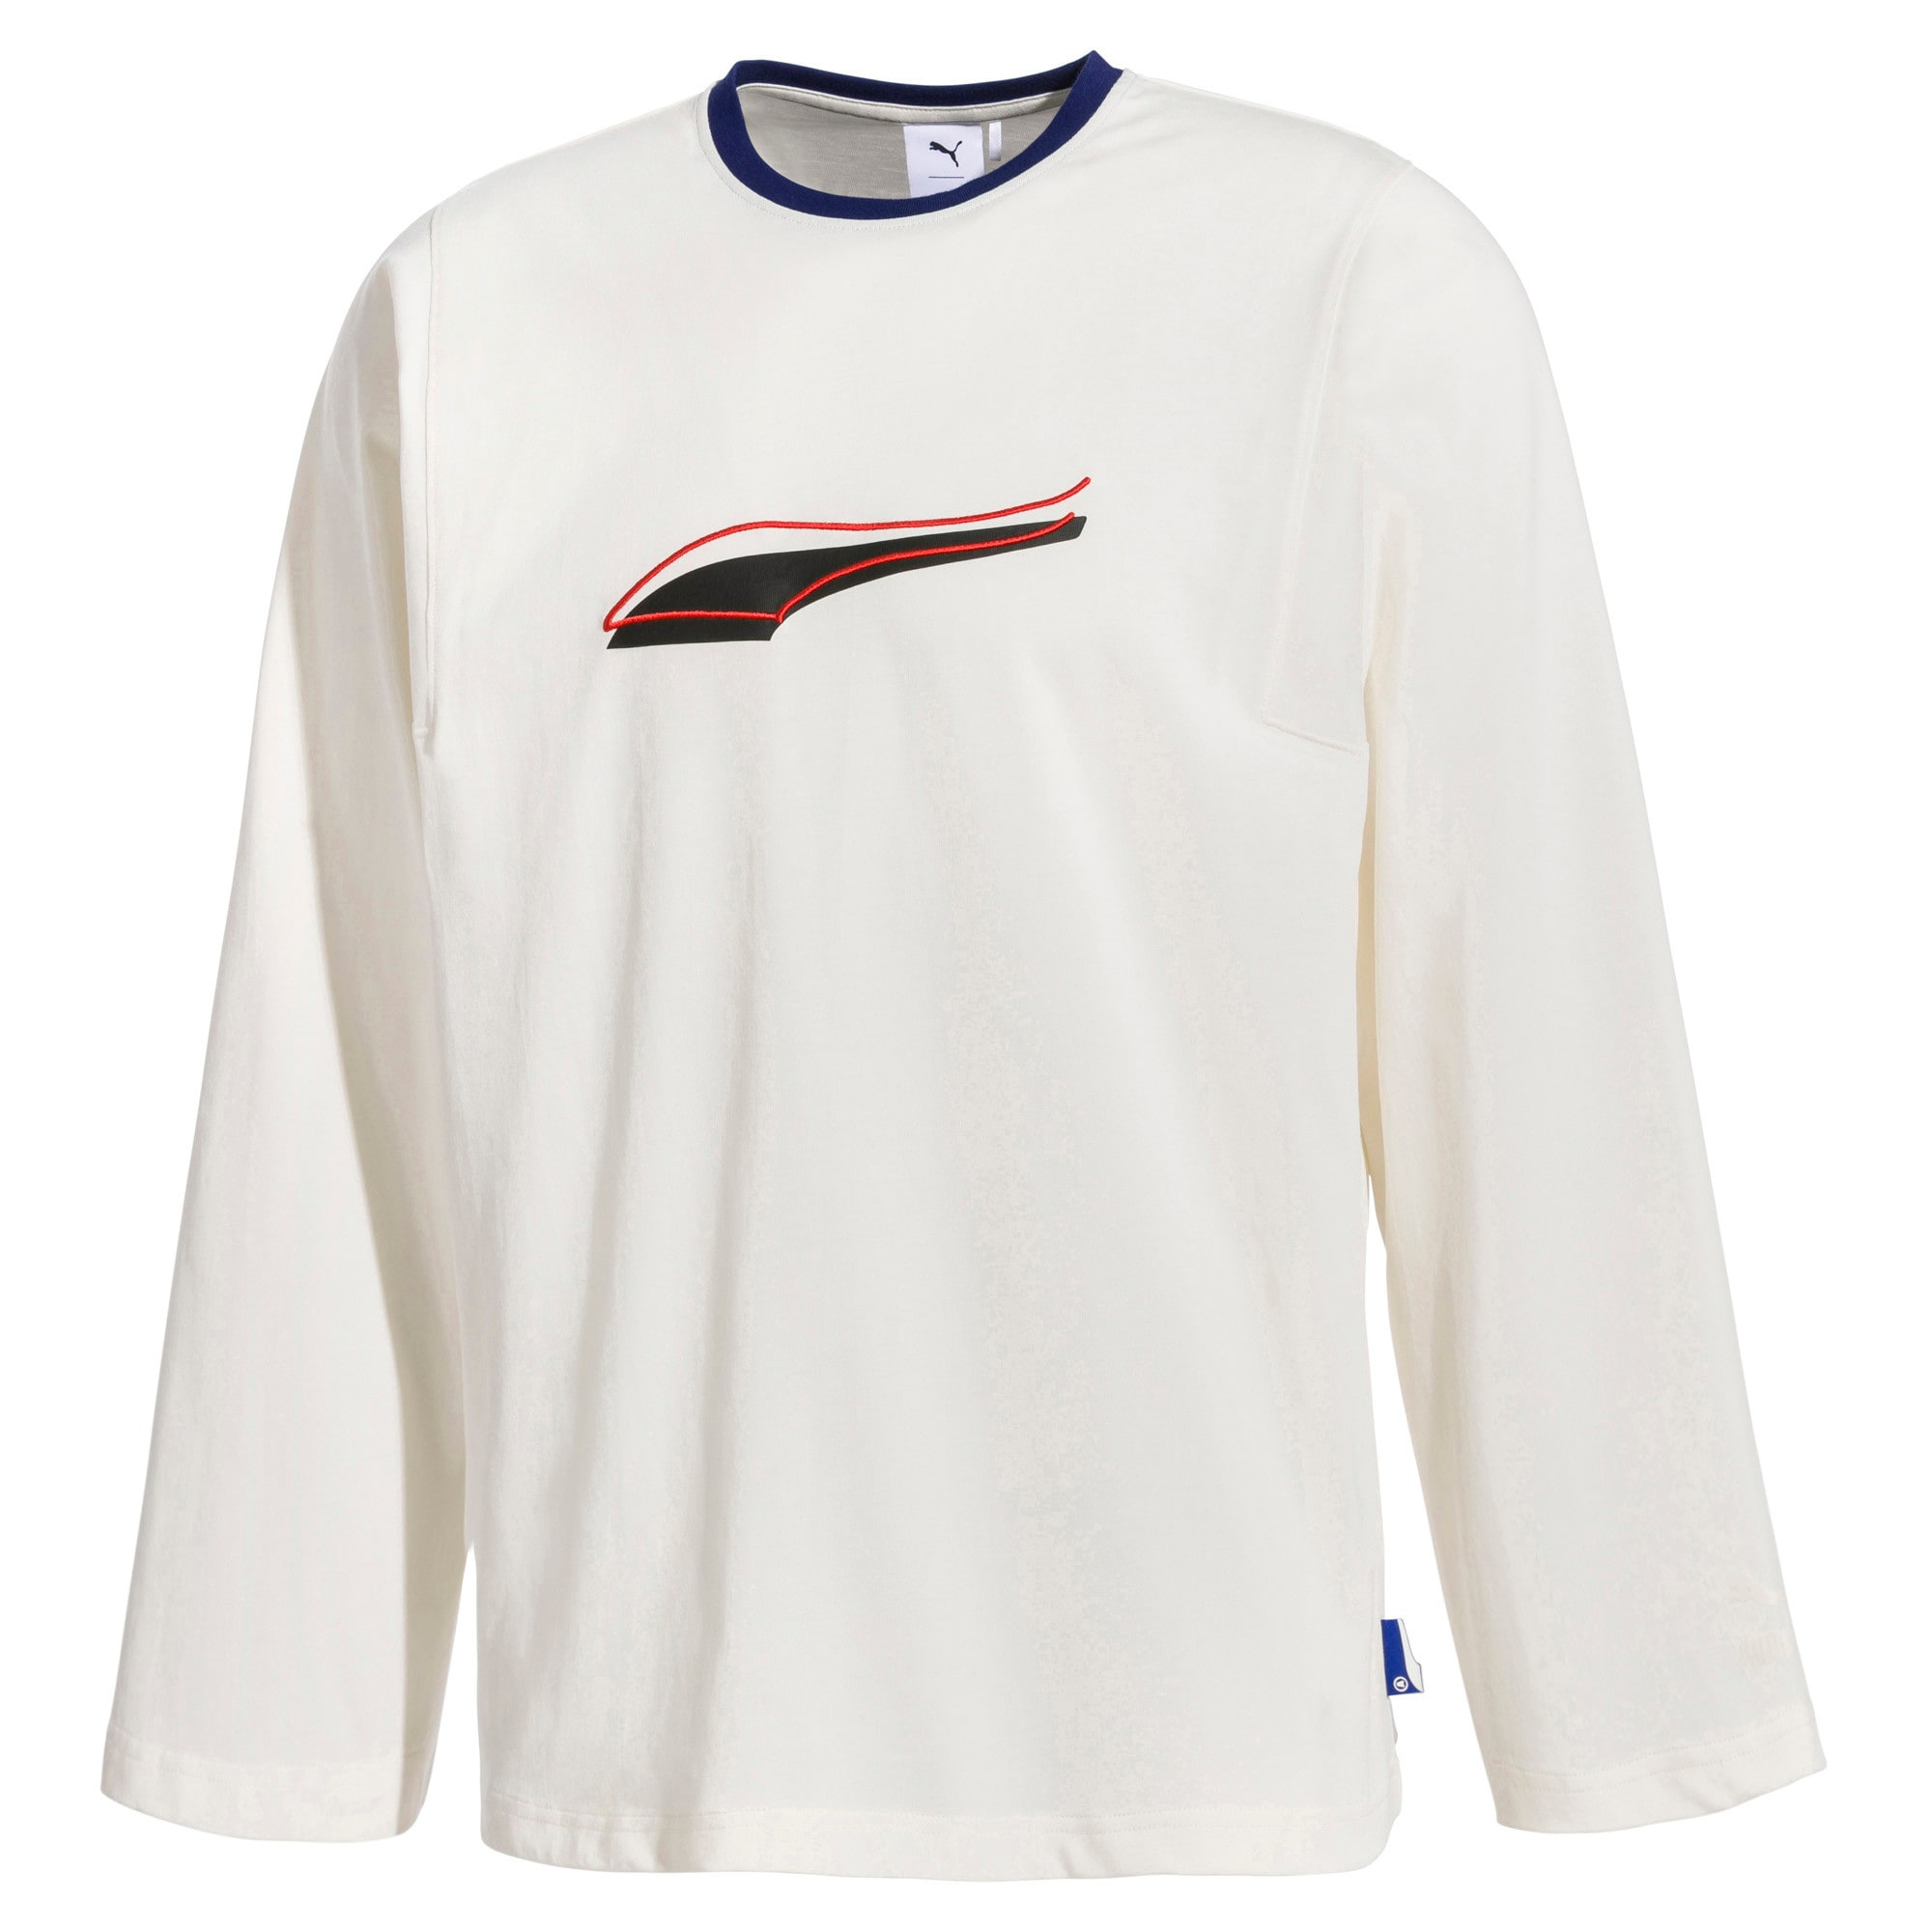 Thumbnail 1 of PUMA x ADER ERROR Langarm-Shirt, Whisper White, medium